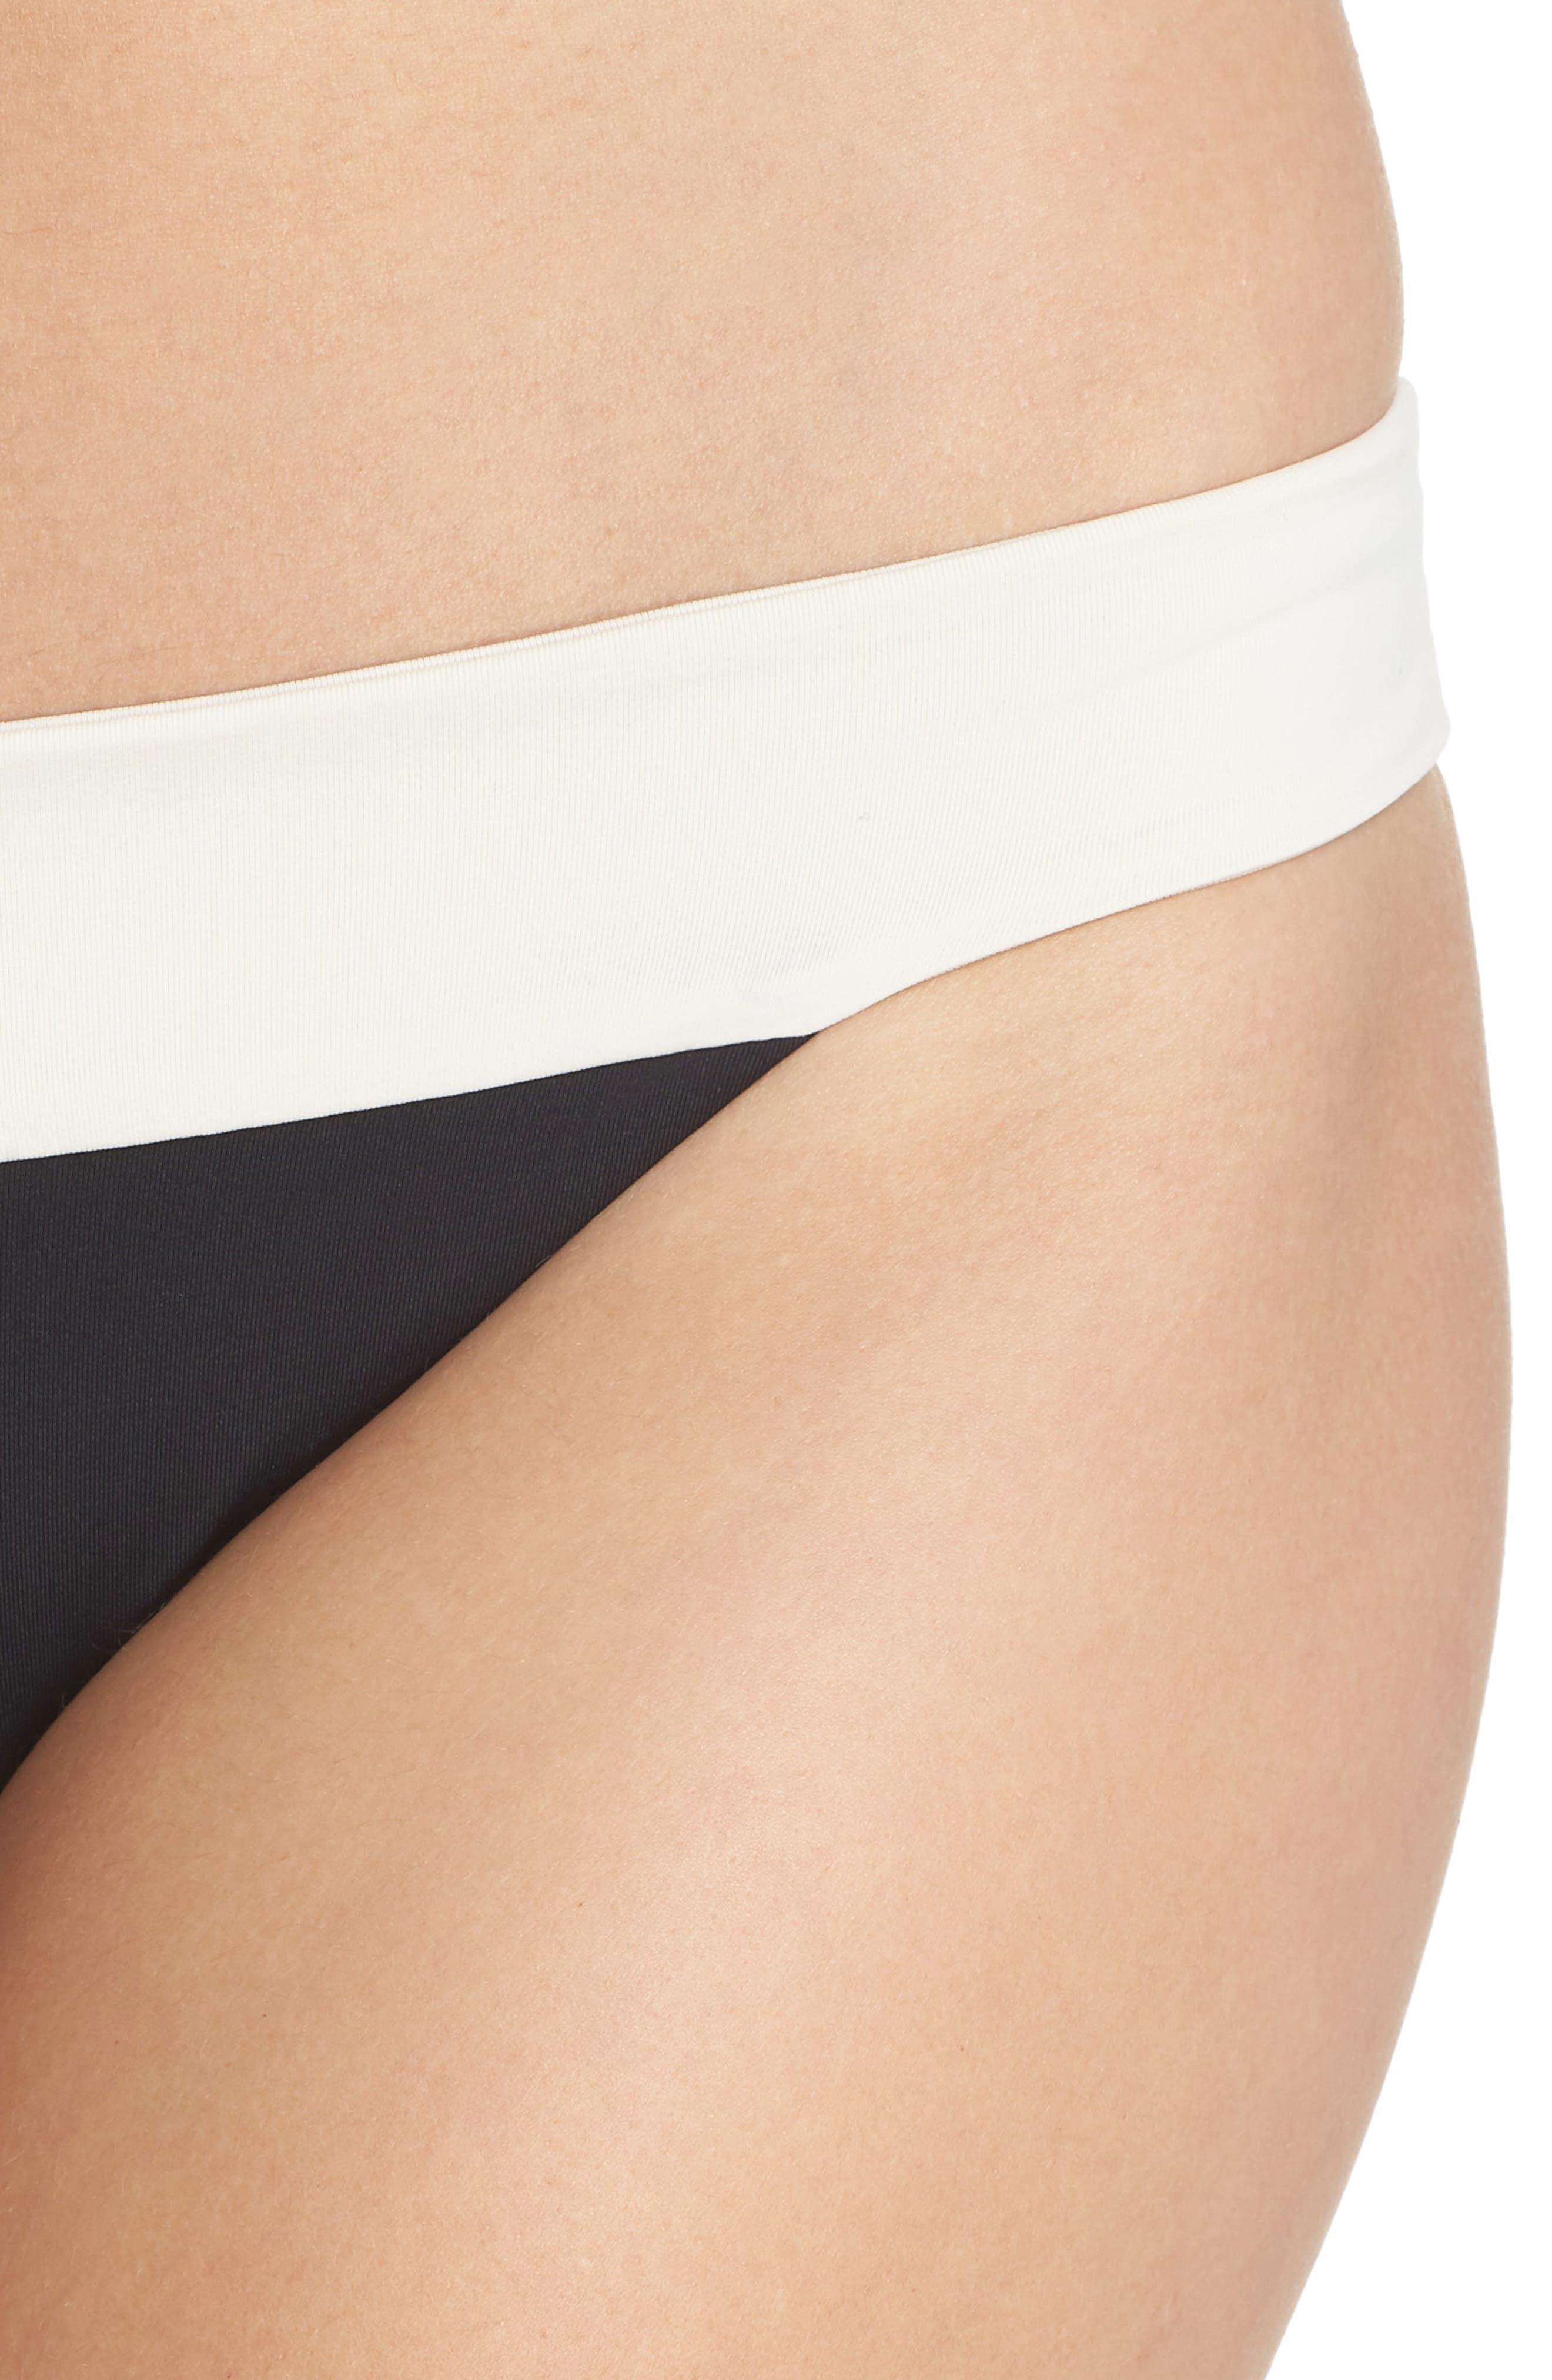 Reversible Bikini Bottom,                             Alternate thumbnail 4, color,                             CREAM/ BLACK/ CAMEL